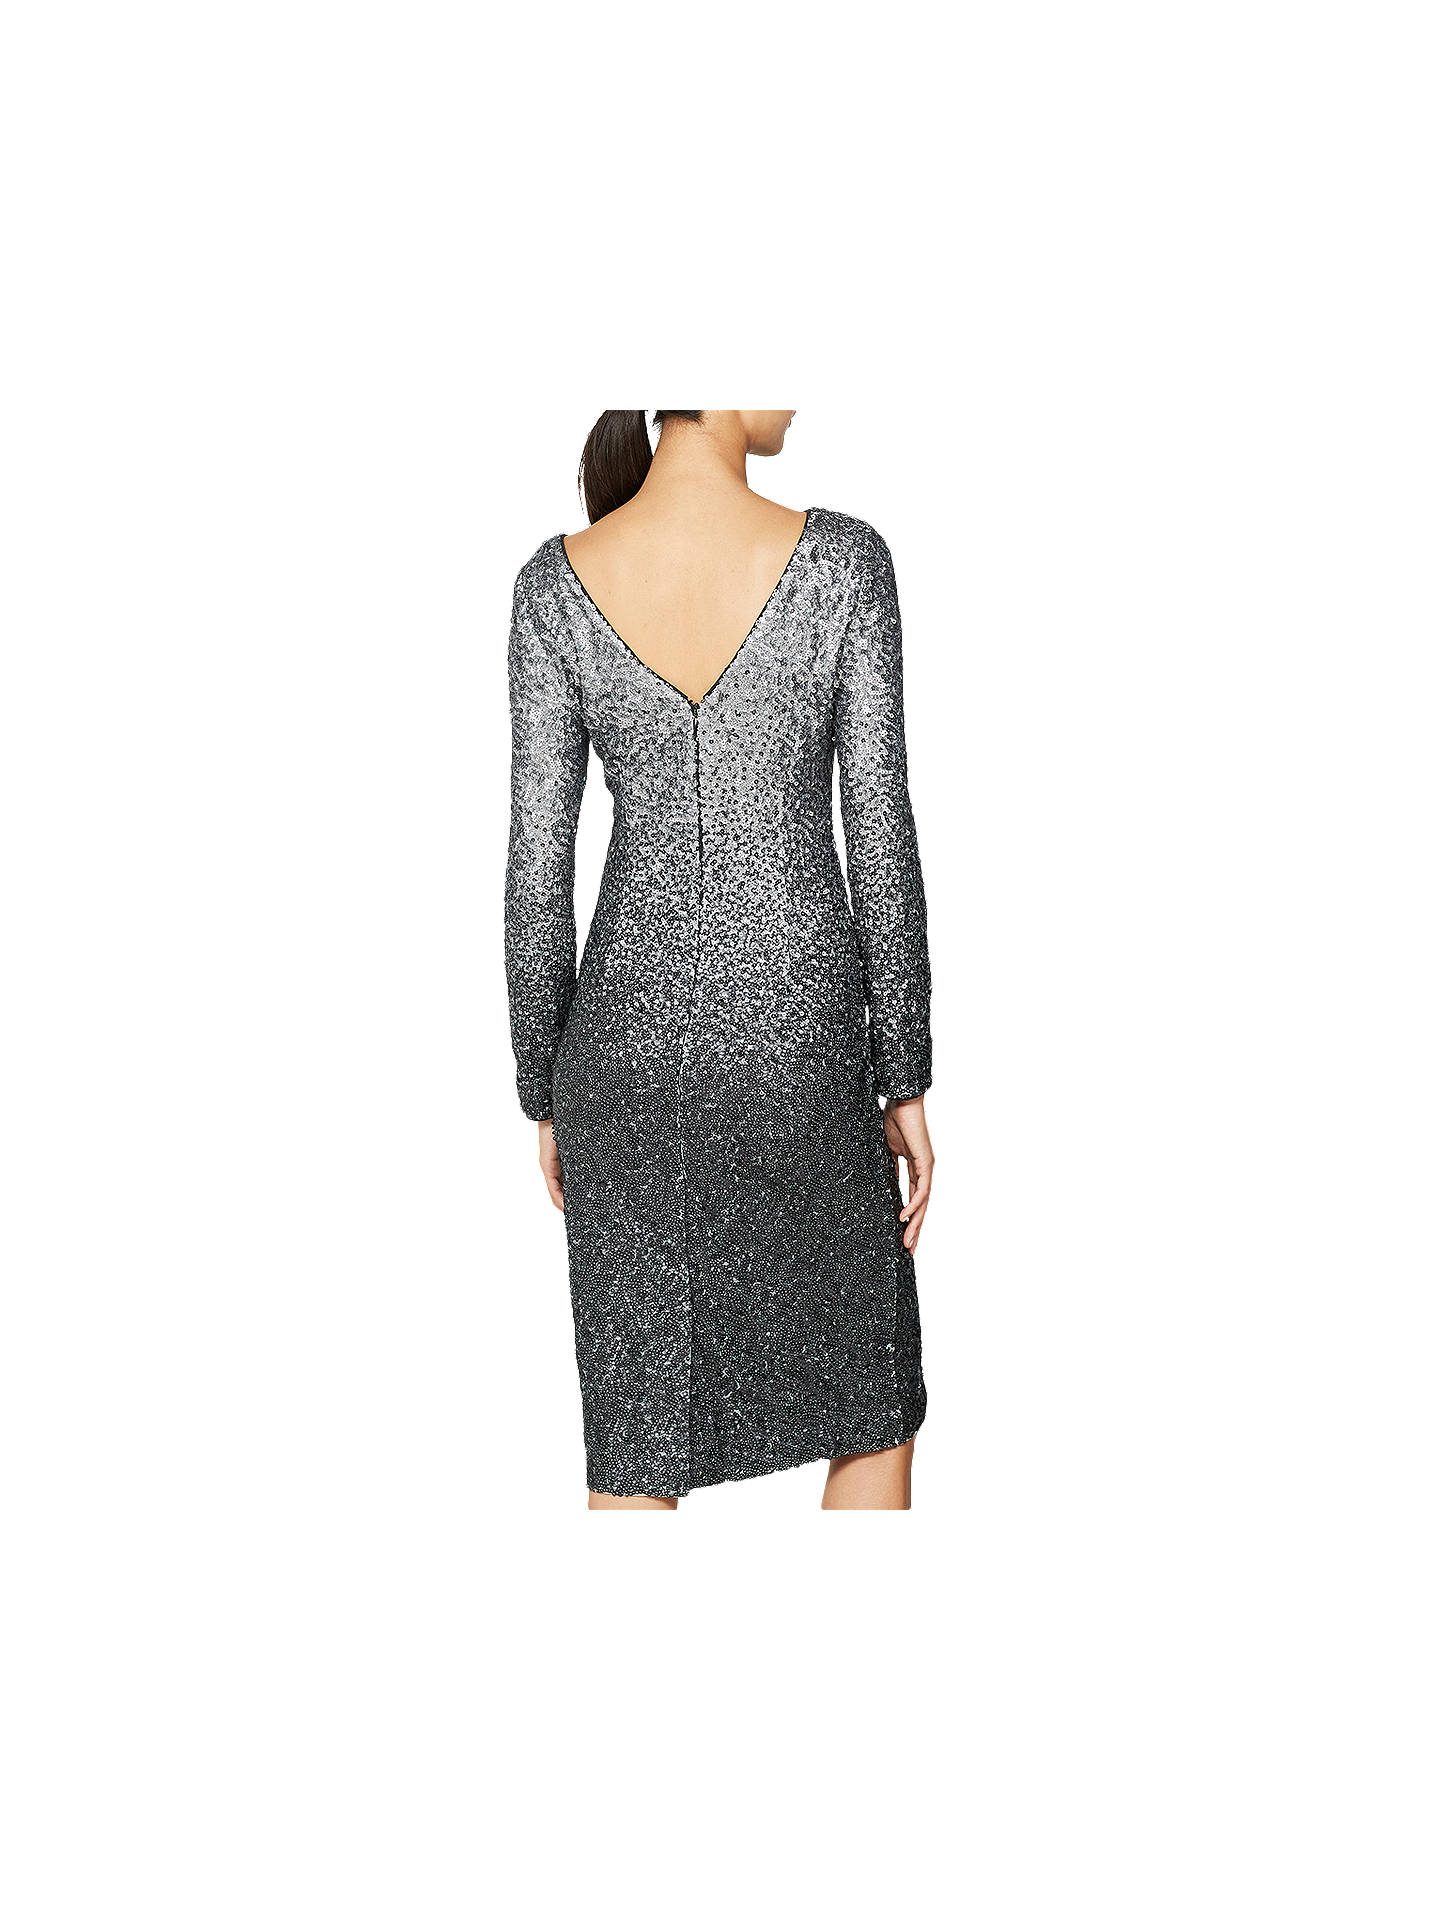 9d8056391c9 ... Buy Mint Velvet Ombre Sequin Midi Dress